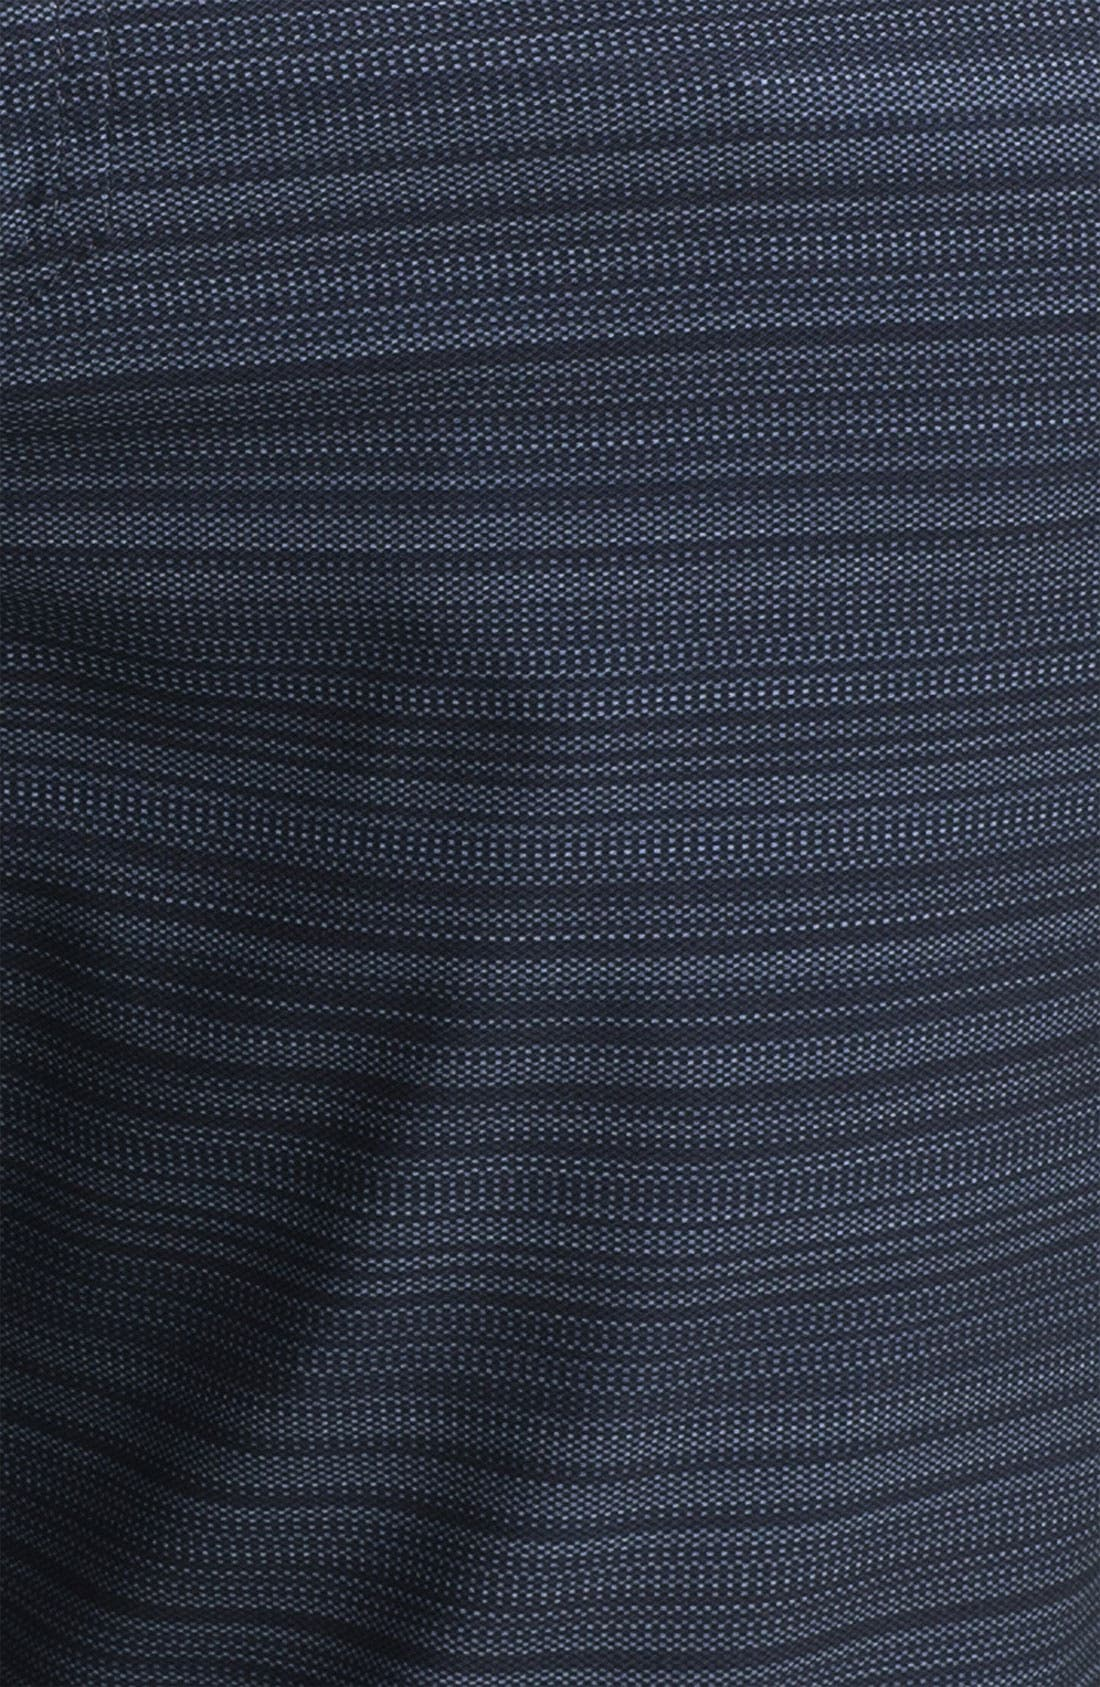 Alternate Image 3  - O'Neill 'Wall Street' Hybrid Shorts